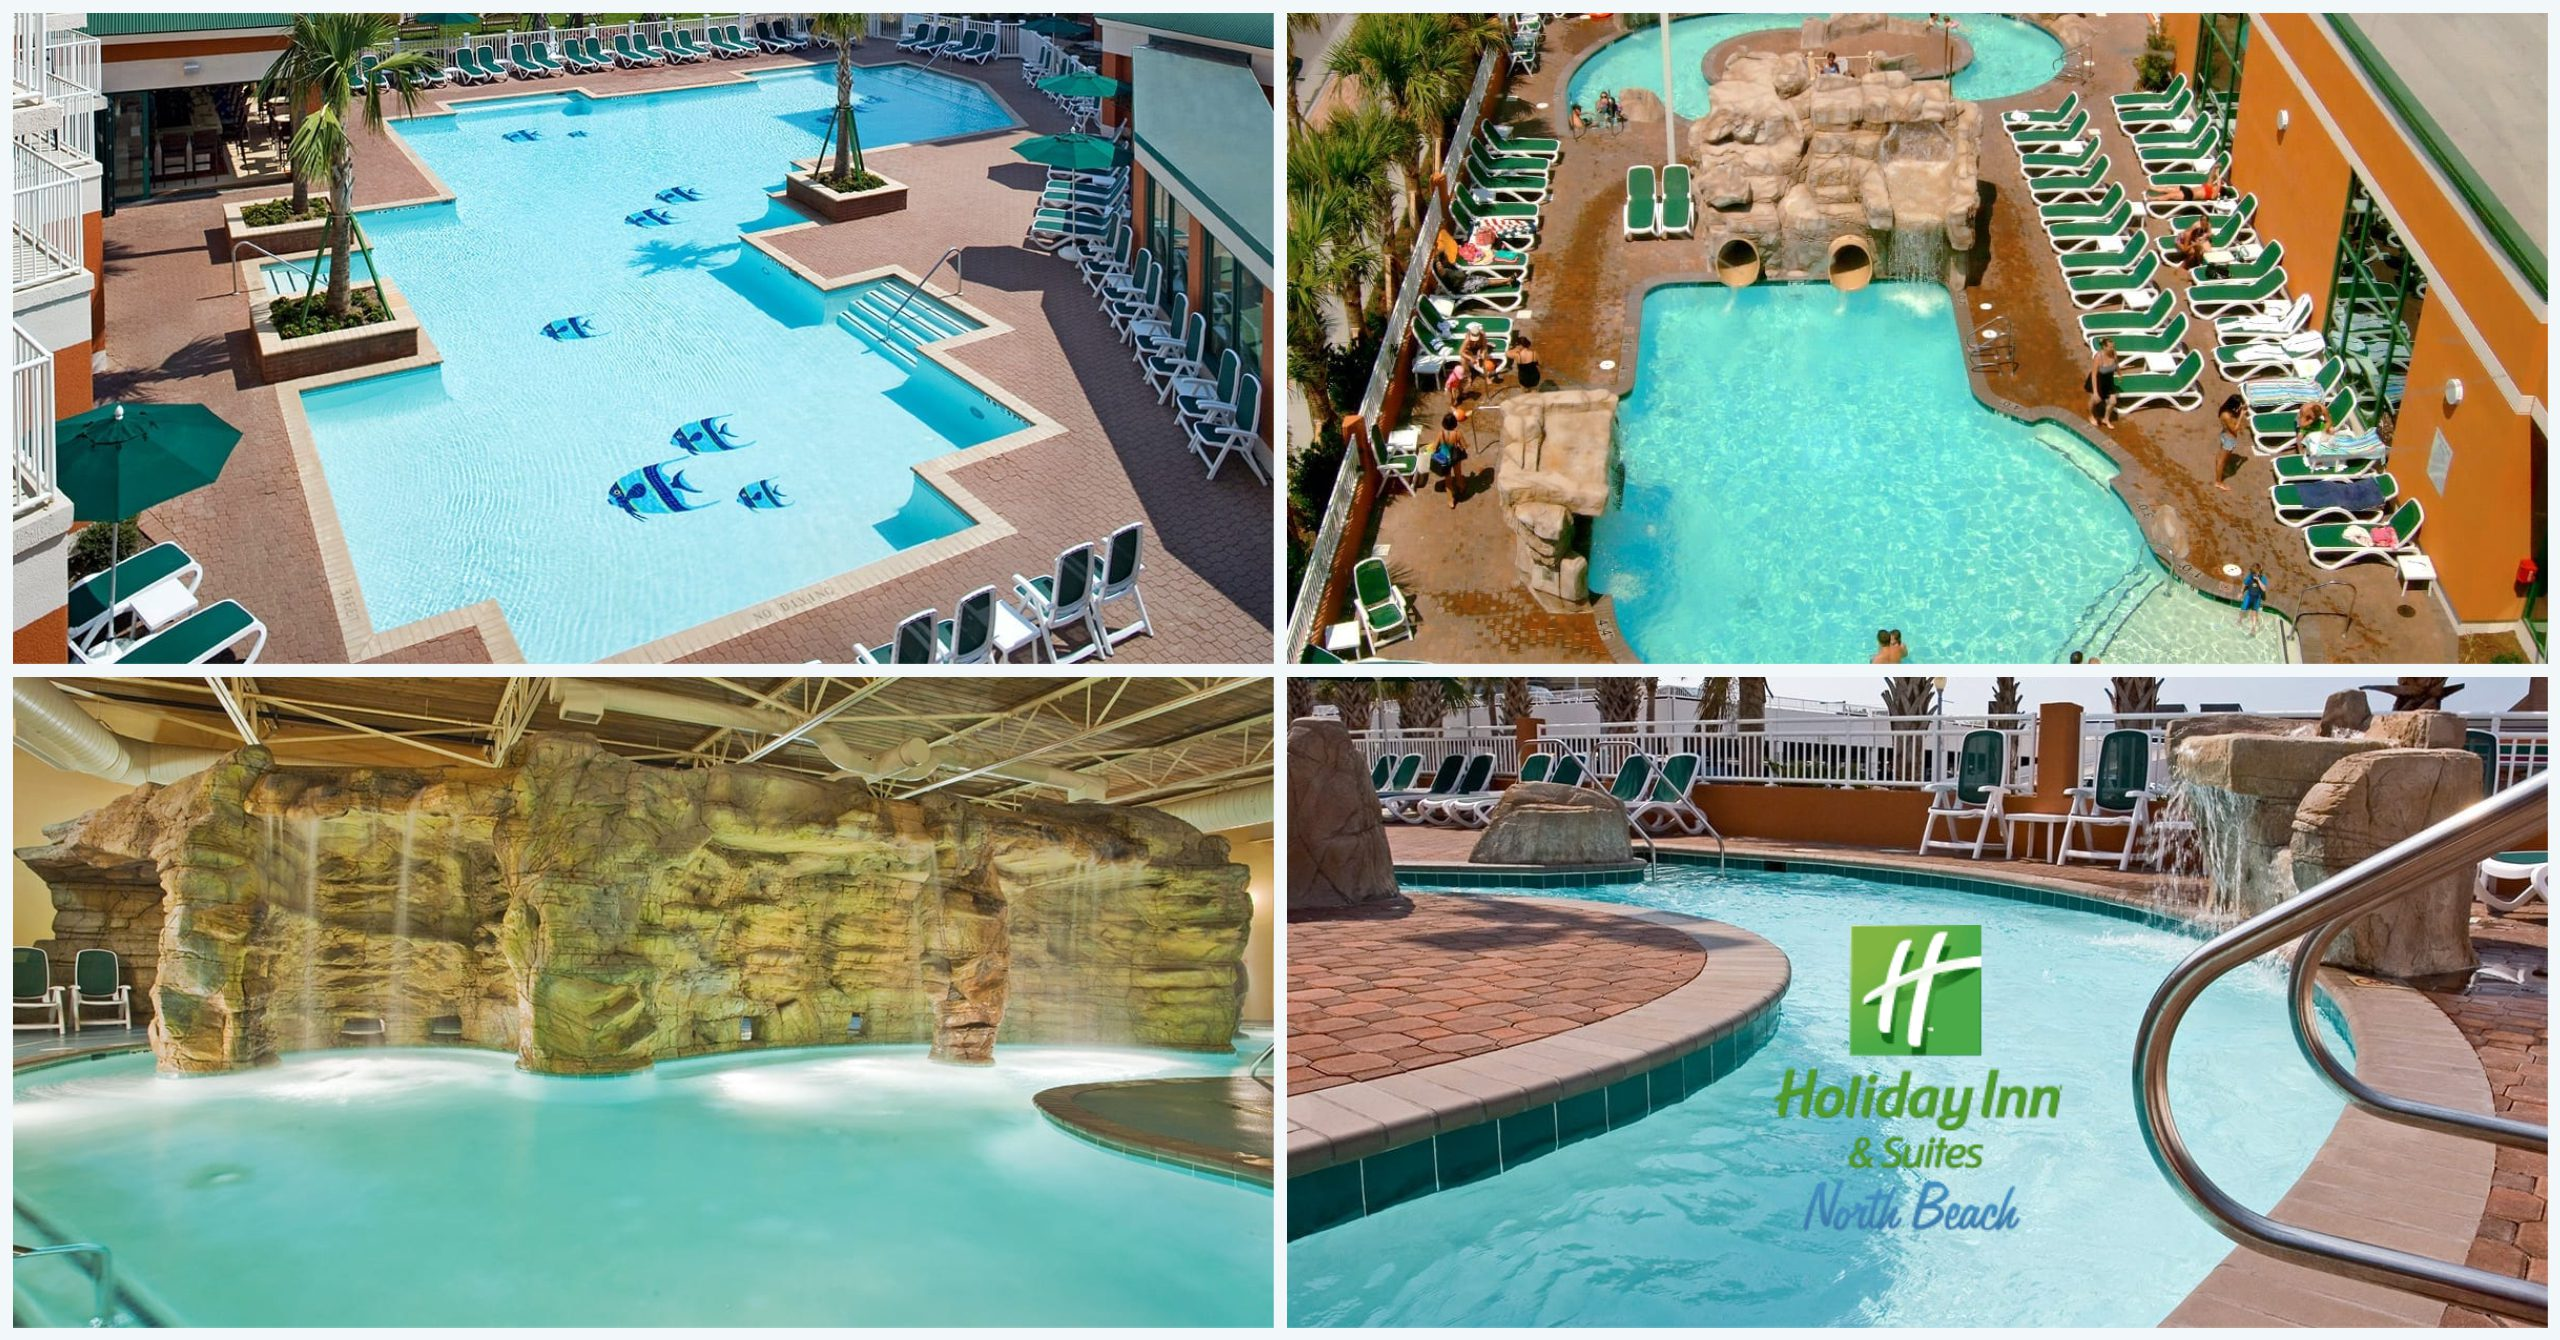 Virginia Beach Oceanfront Hotel - Virginia Beach Waterpark